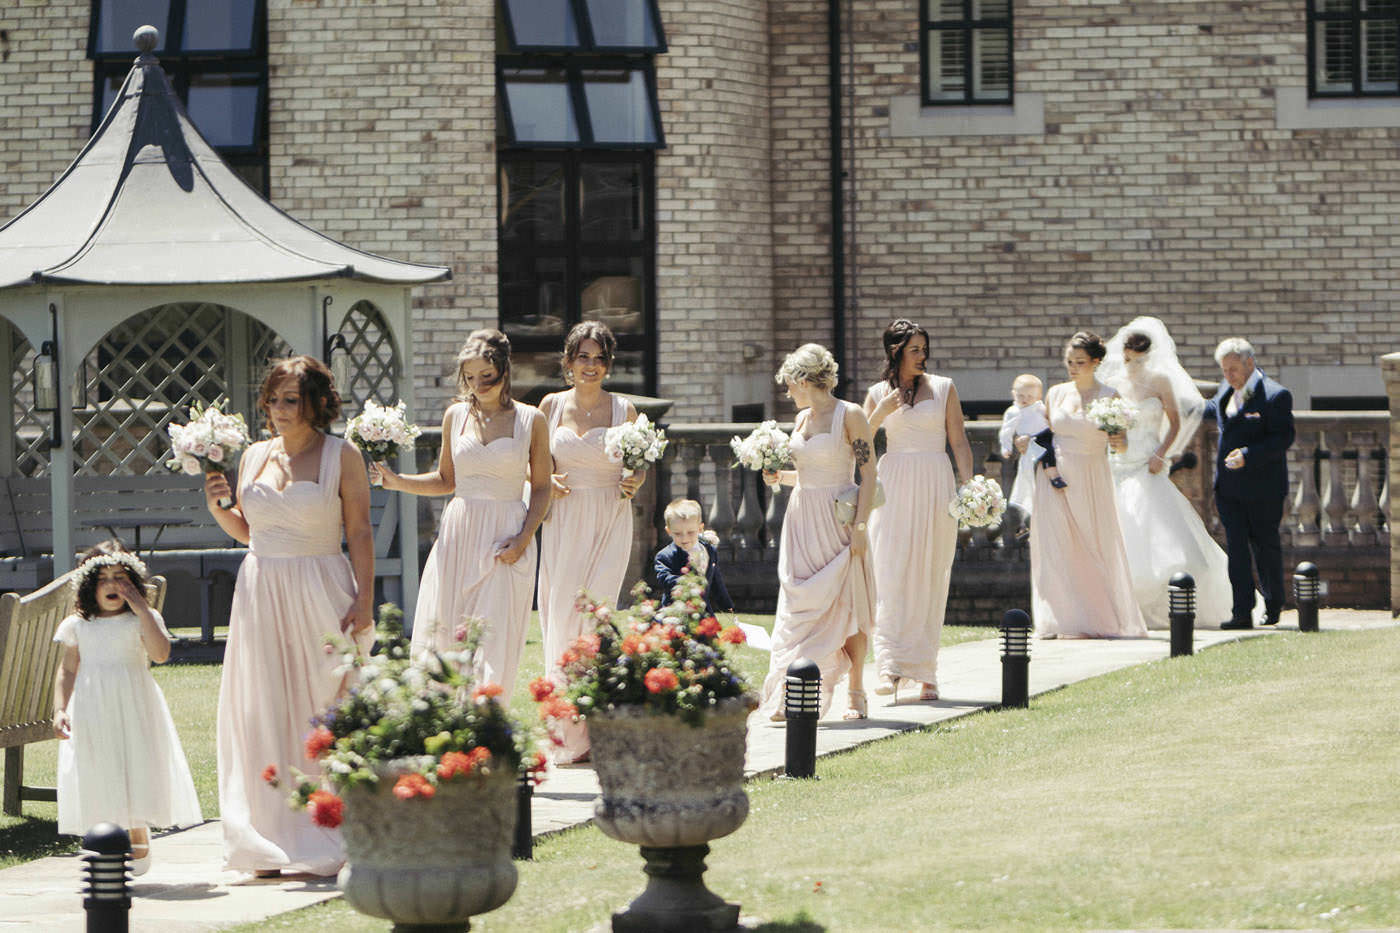 lukeemily foxhills wedding photographer 0041